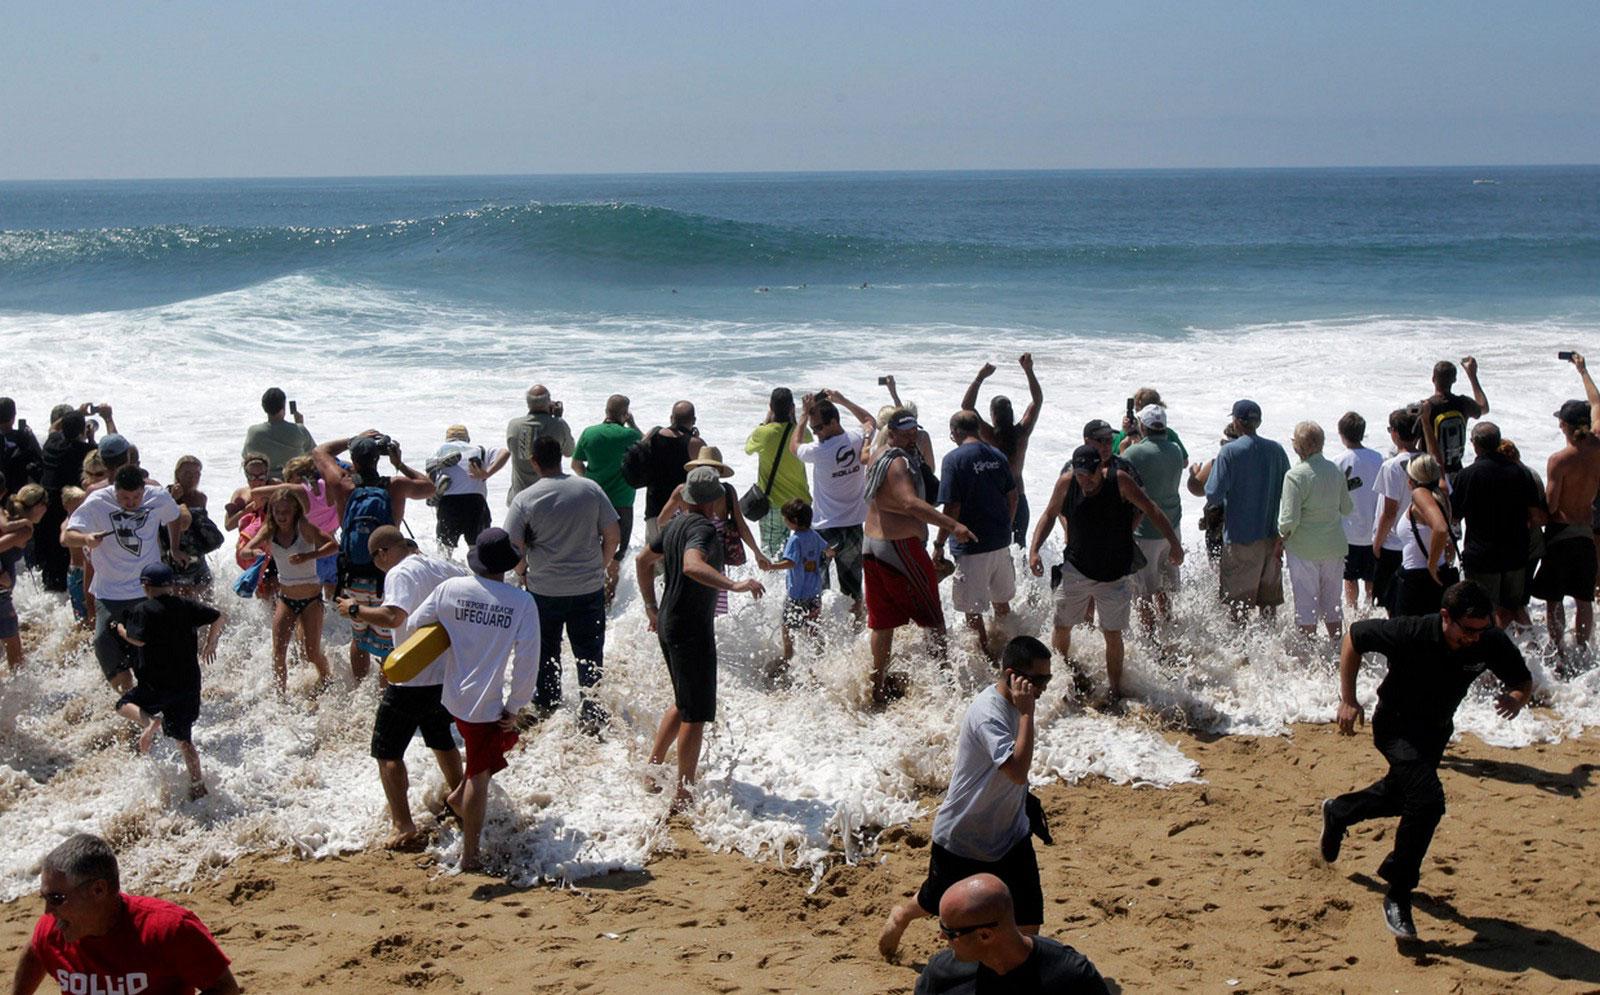 волна окатила людей на пляже